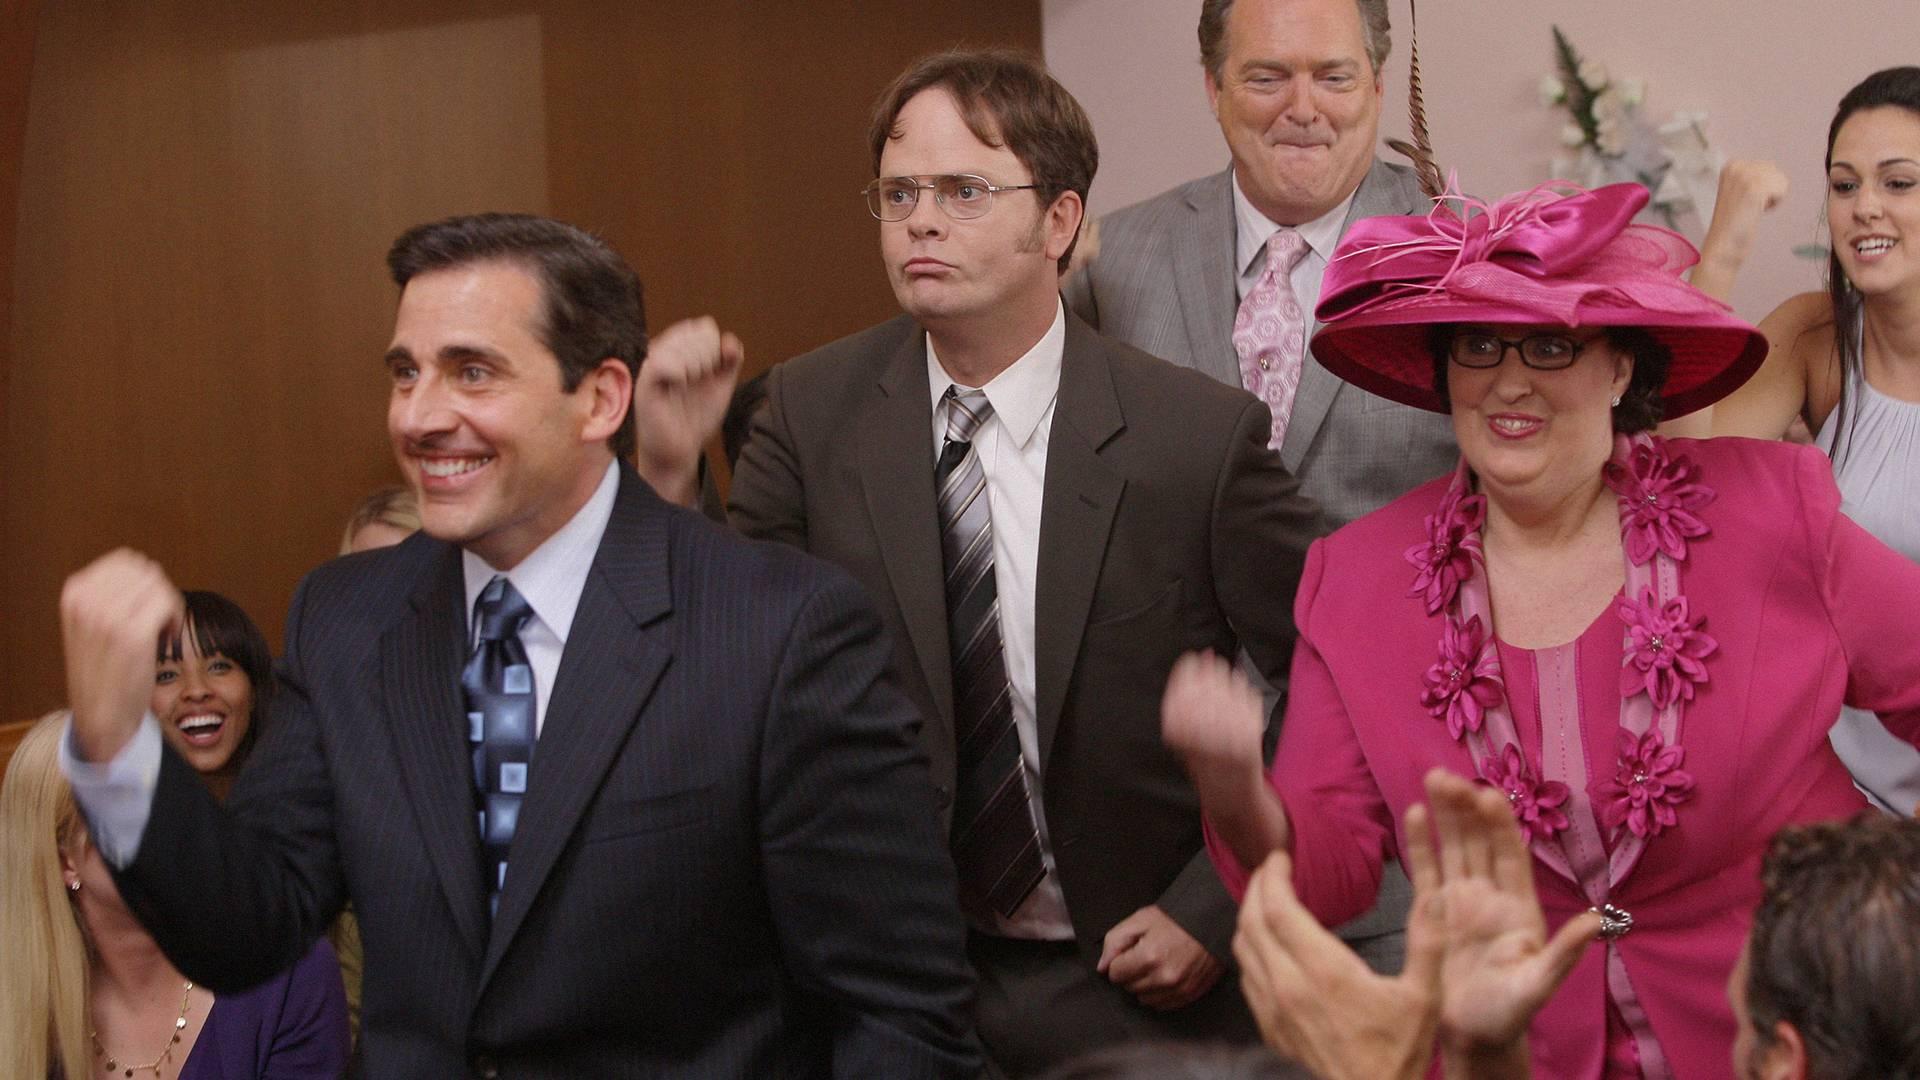 The Office Season 6 Episode 5